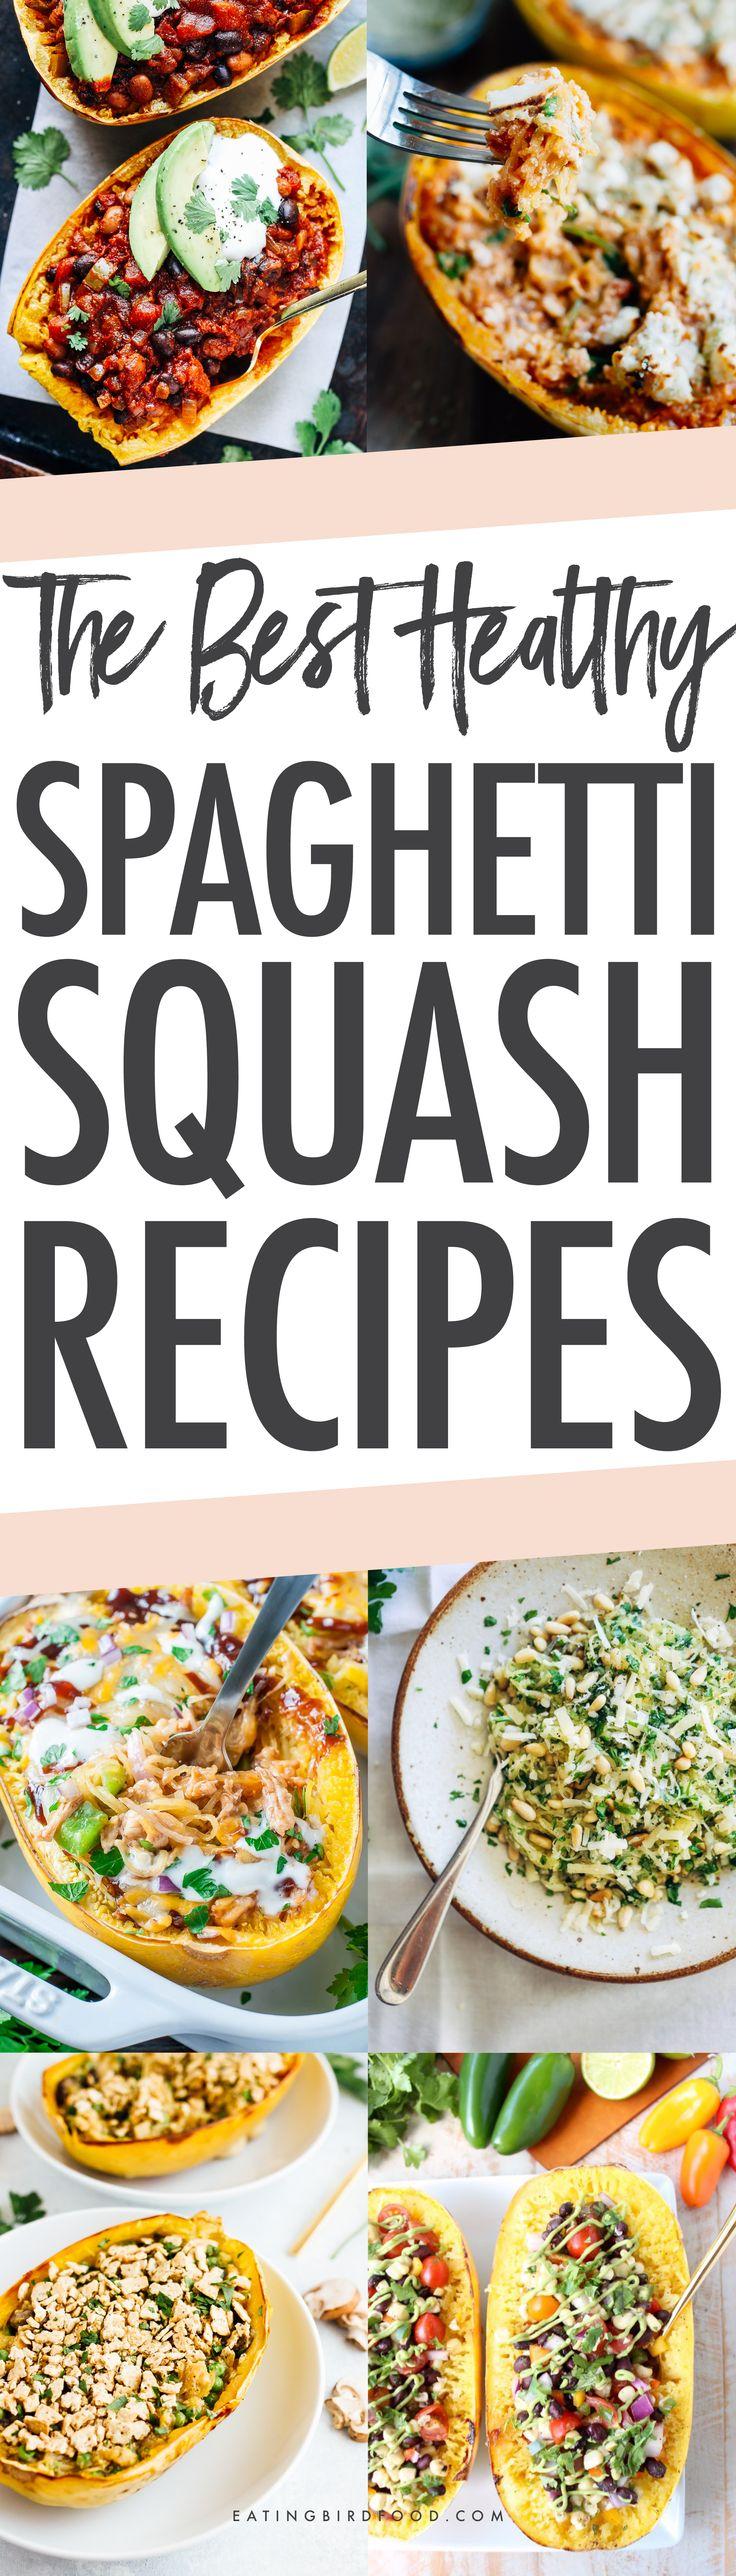 22 Healthy Spaghetti Squash Recipes